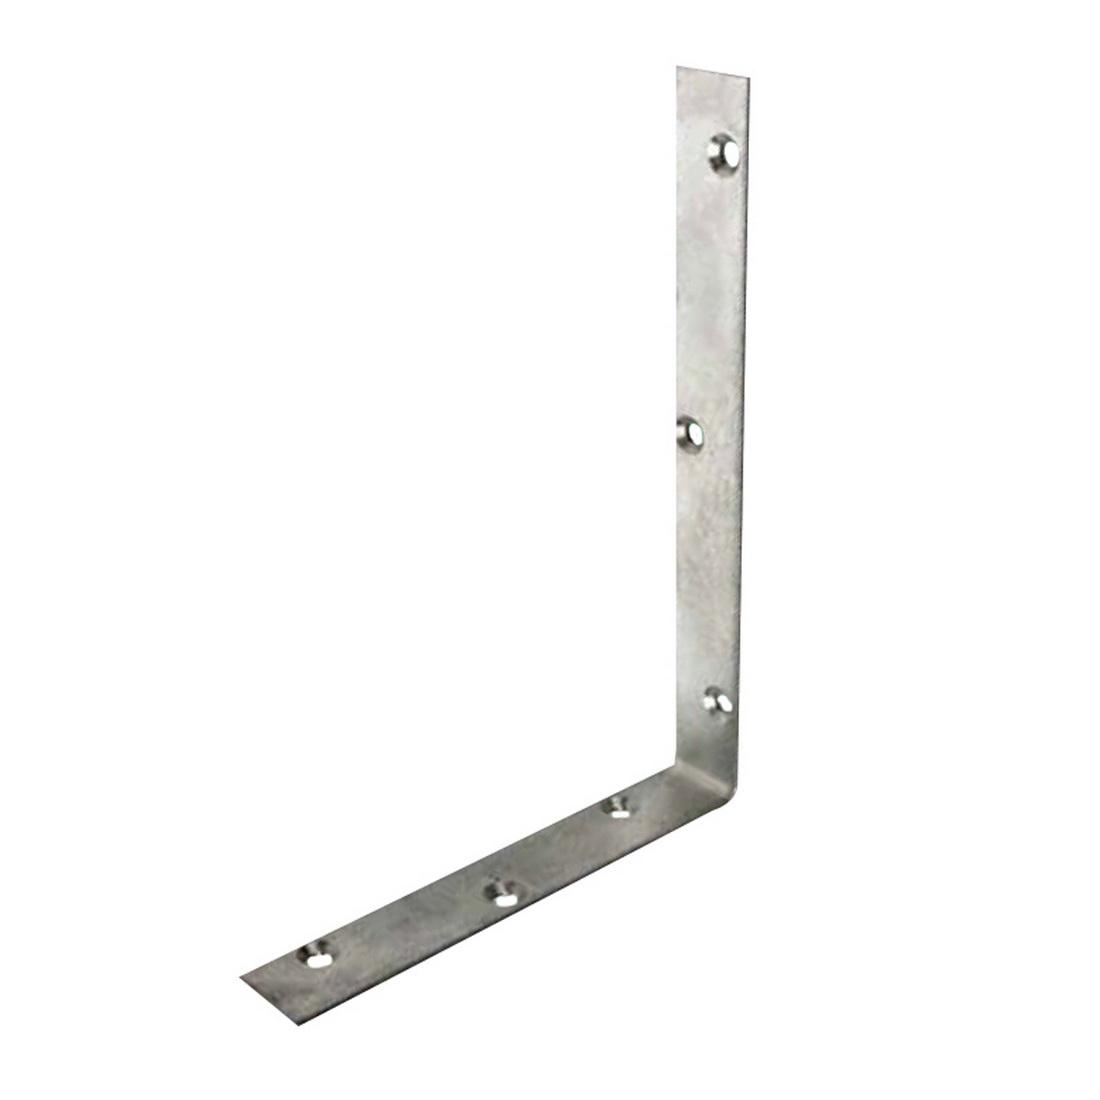 Angle Bracket 25 x 13mm Zinc Plated BANSZ025E013R